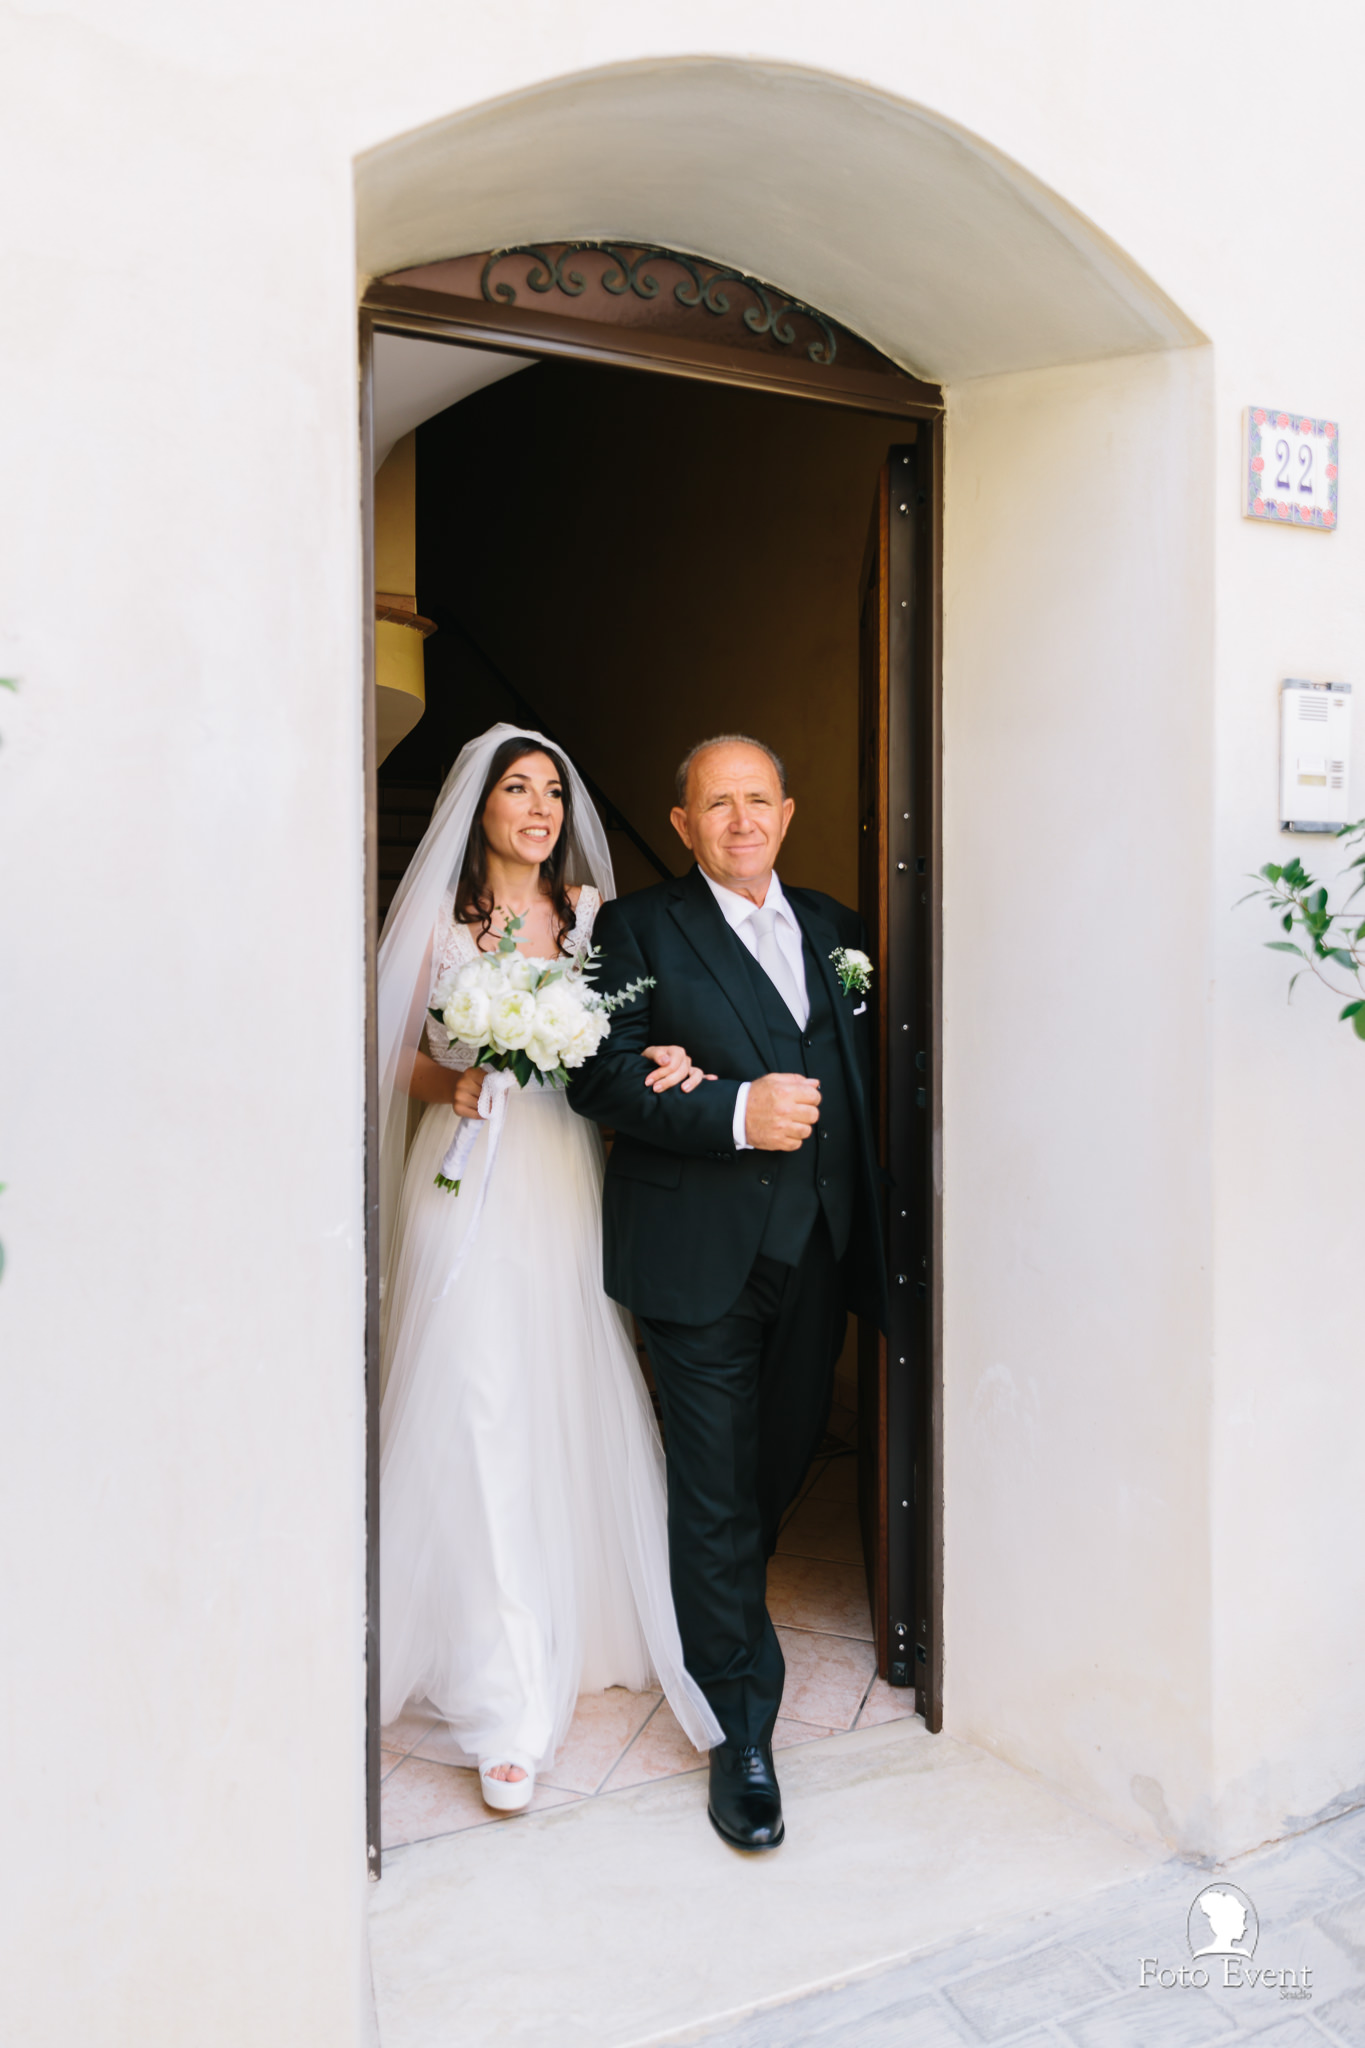 019-2019-08-23-Matrimonio-Lucia-e-Rosario-Scopelliti-5DE-1164